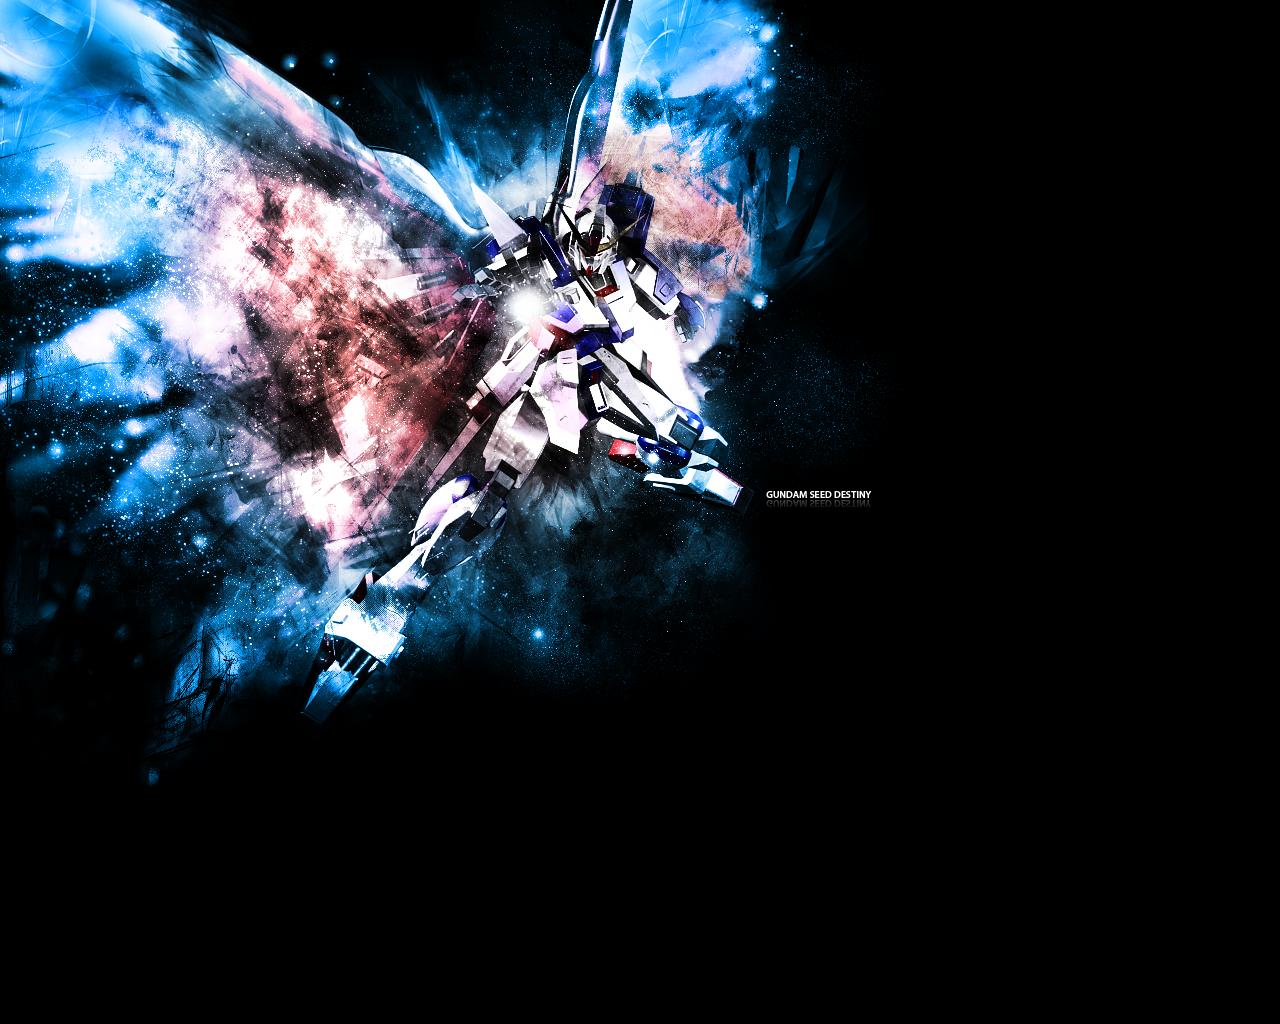 yay gundam by lgiietc Reanimate The Inner Gundam Inside You: 25+ Formidable Gundam Wallpaper Designs